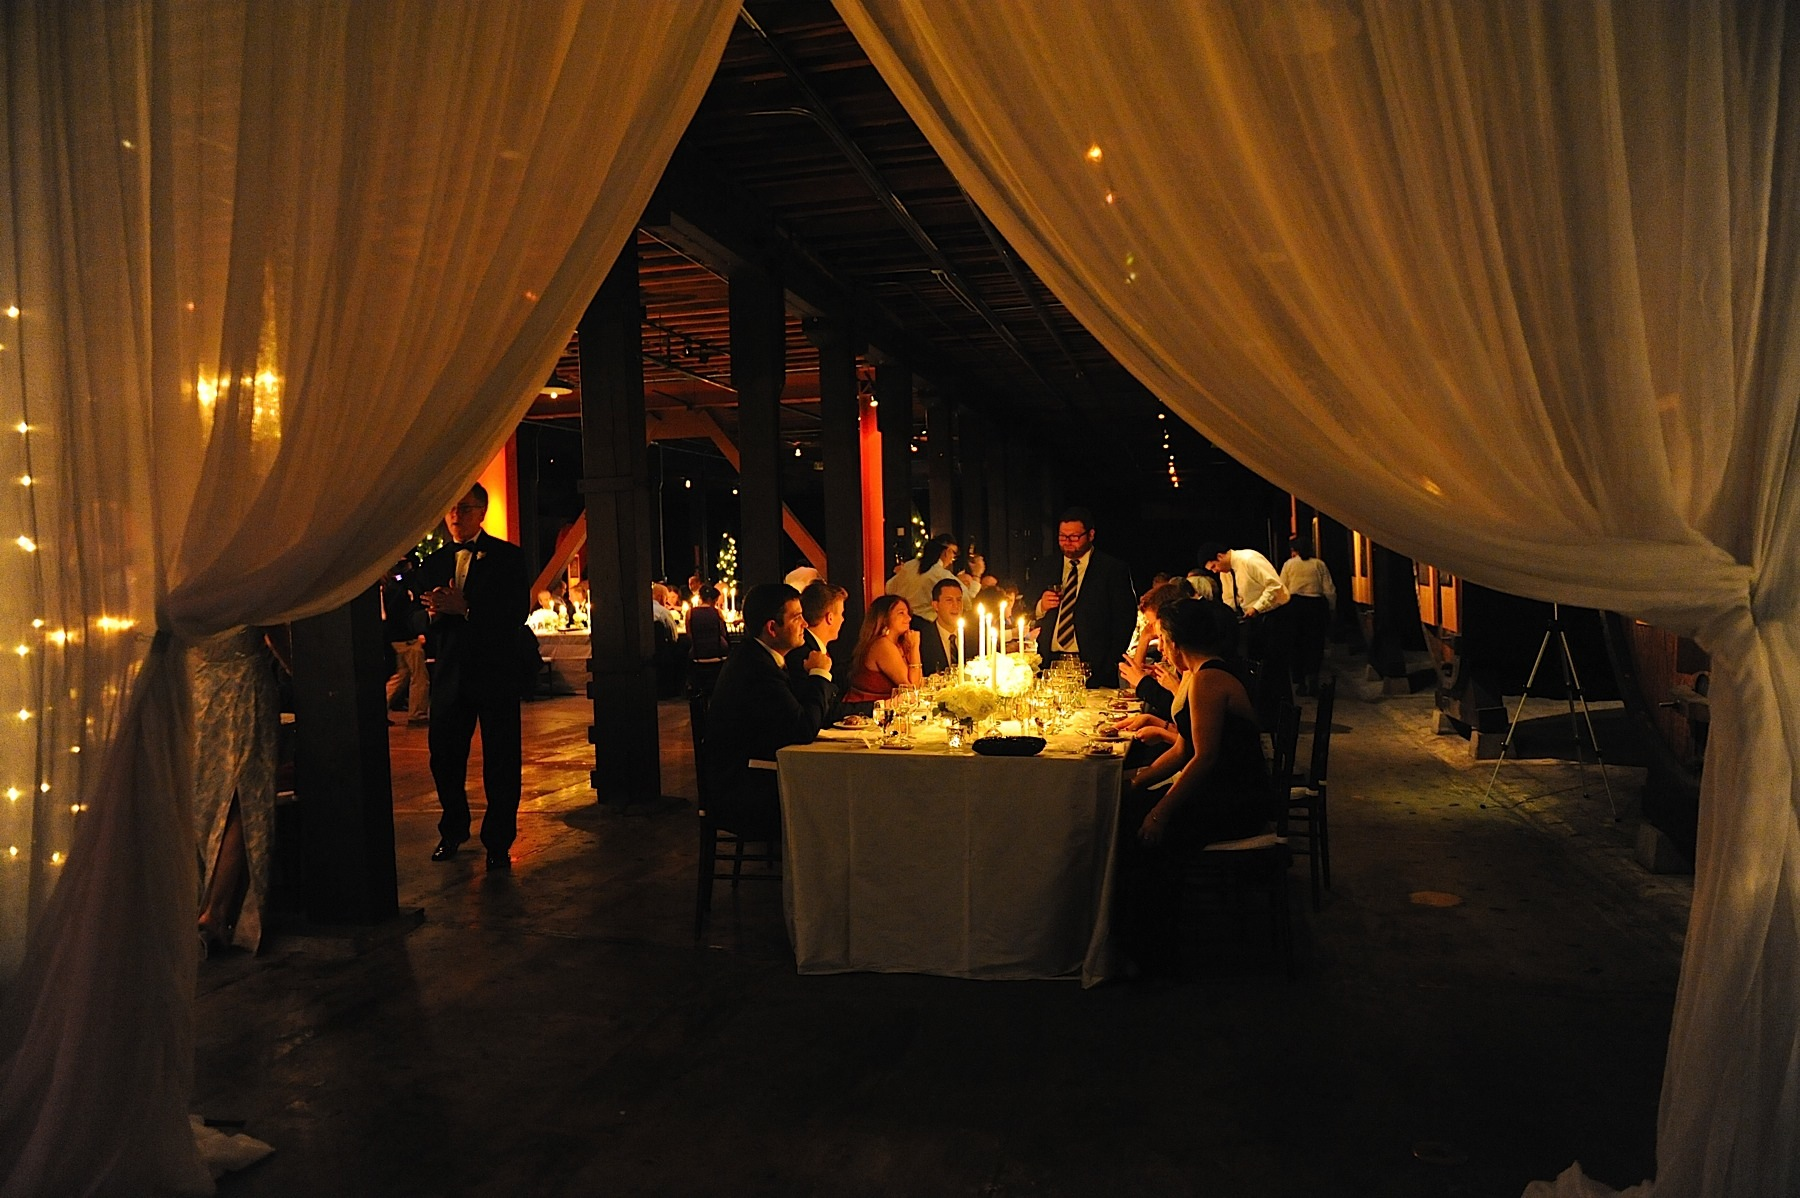 culinary_institute_of_america_napa_valley_wedding_086photographer_